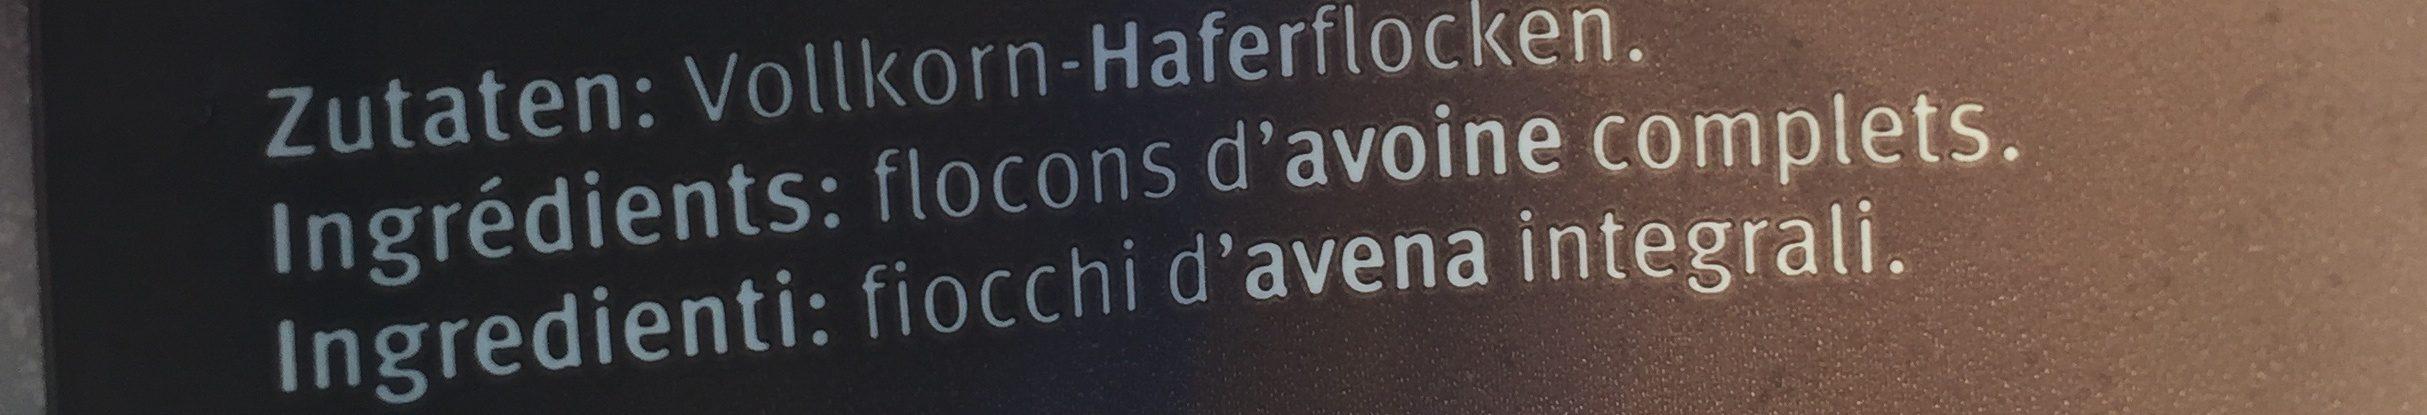 Vollkorn Haferflocken (Grob) - Ingrediënten